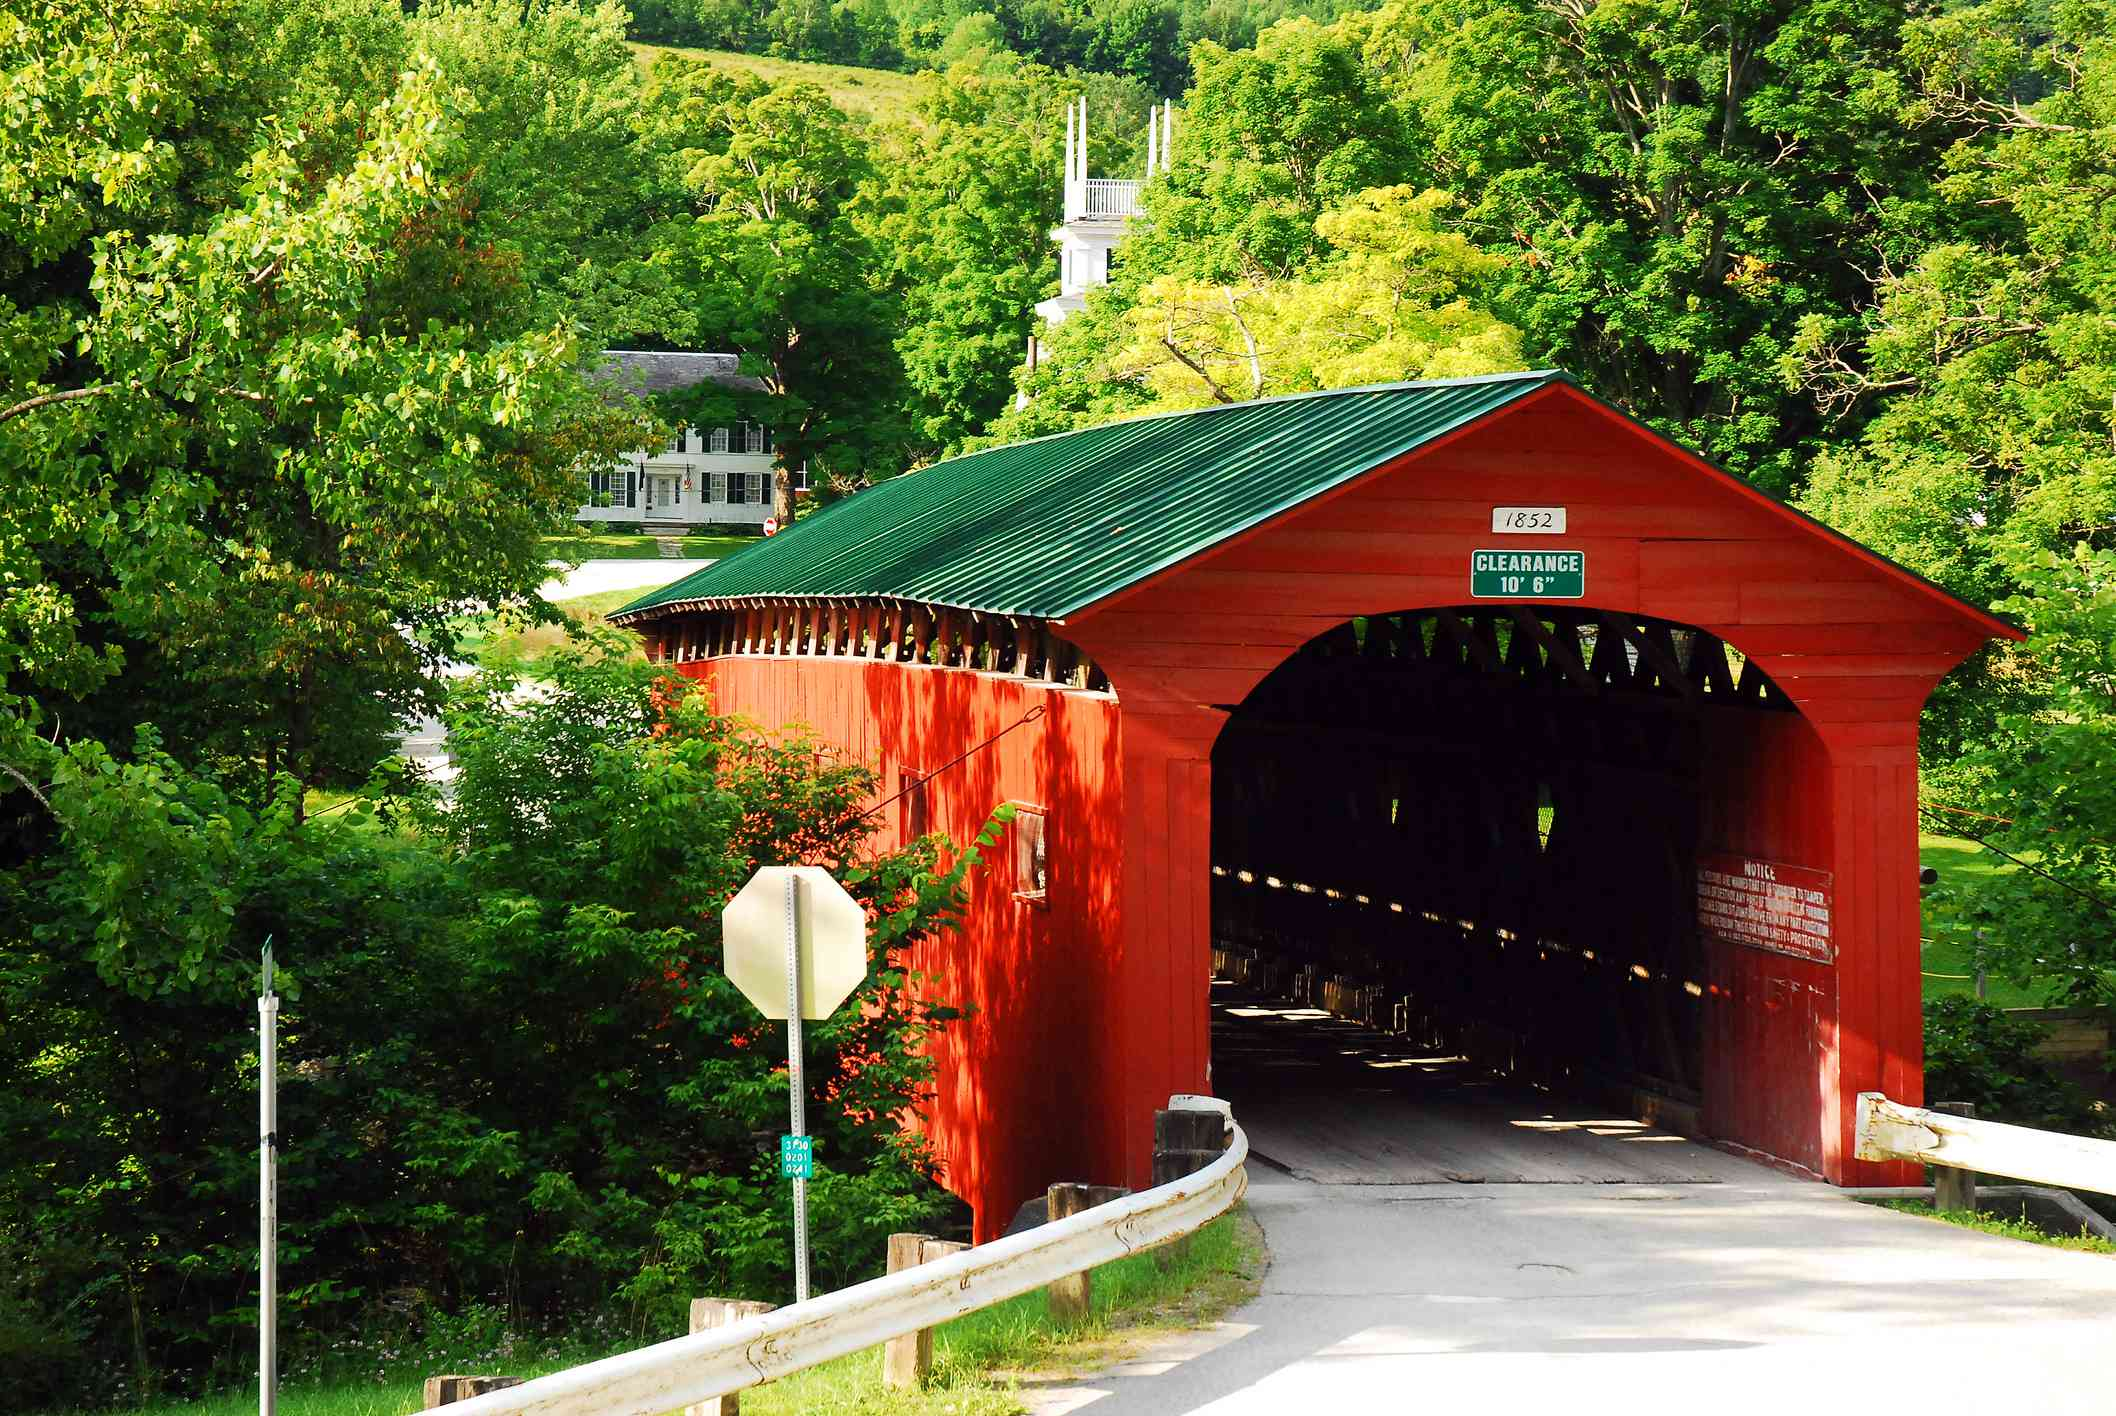 West Arlington Covered Bridge in Vermont